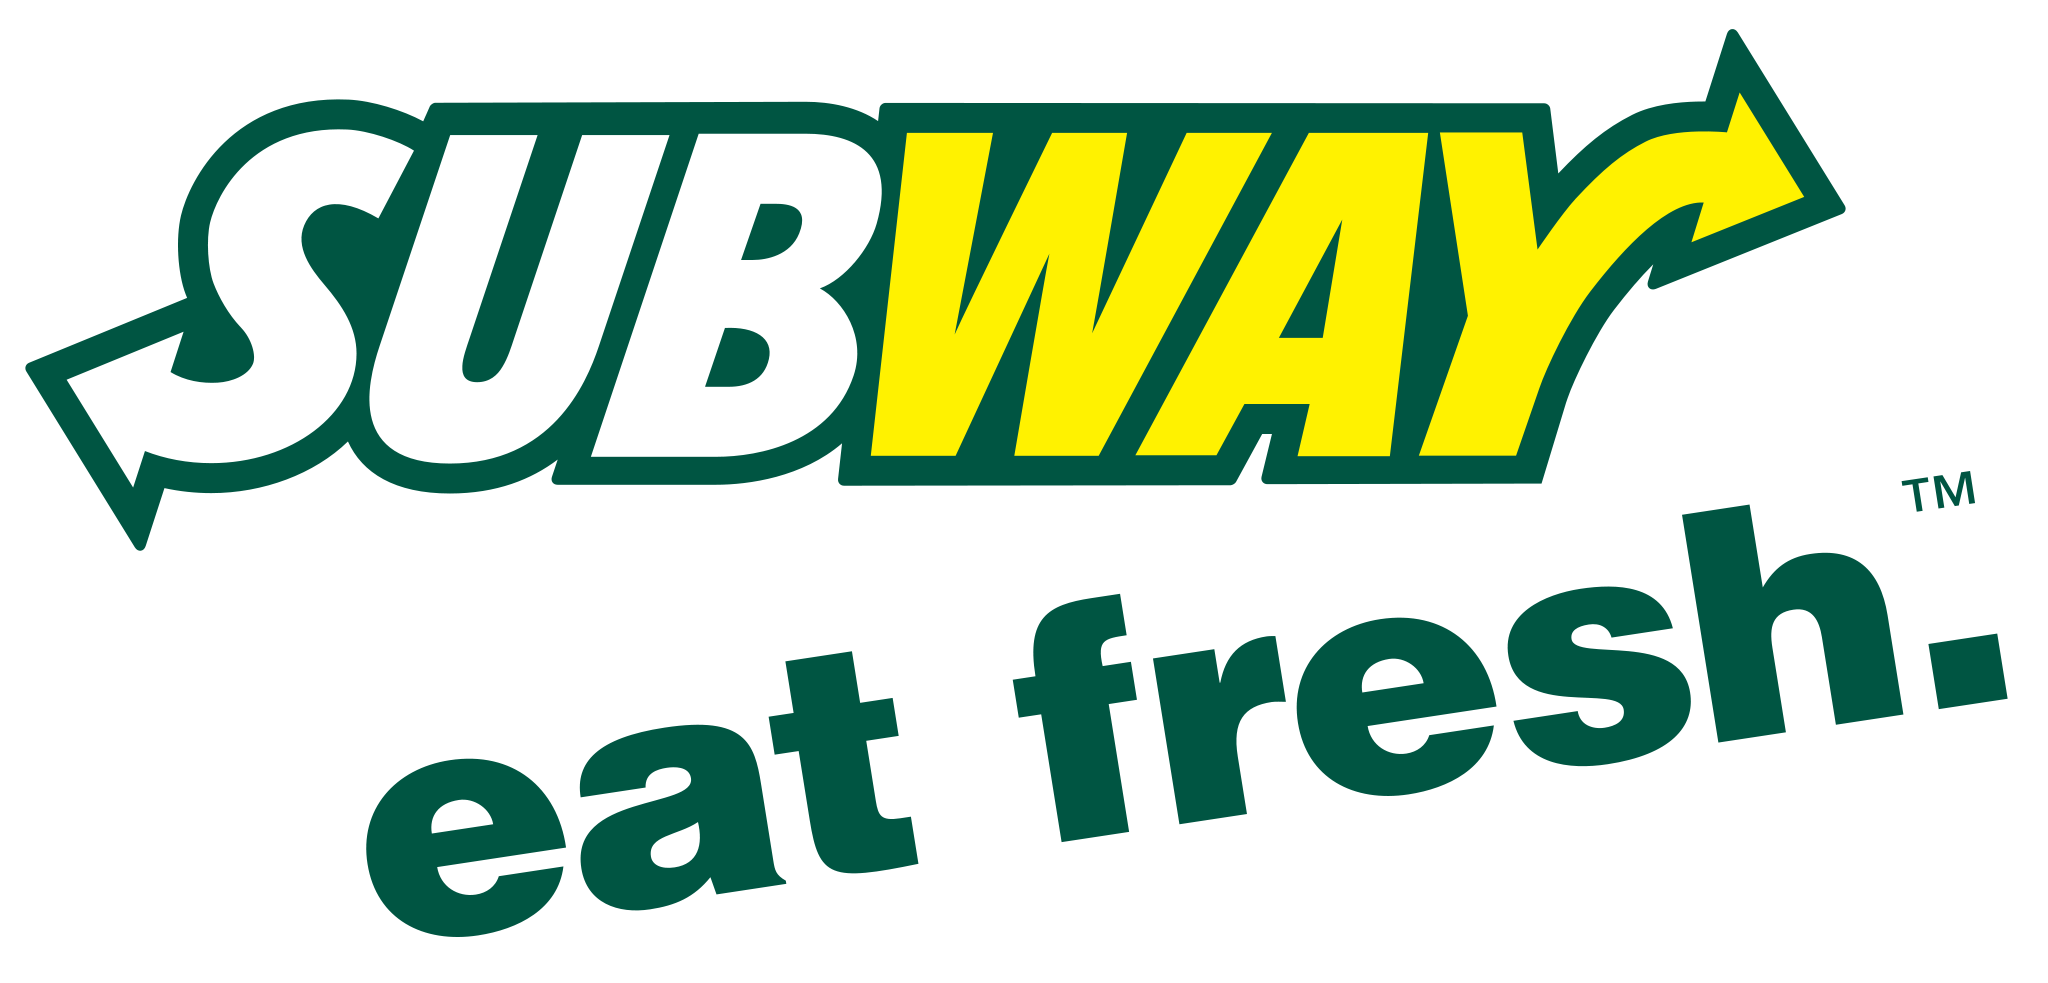 Subway_restaurant